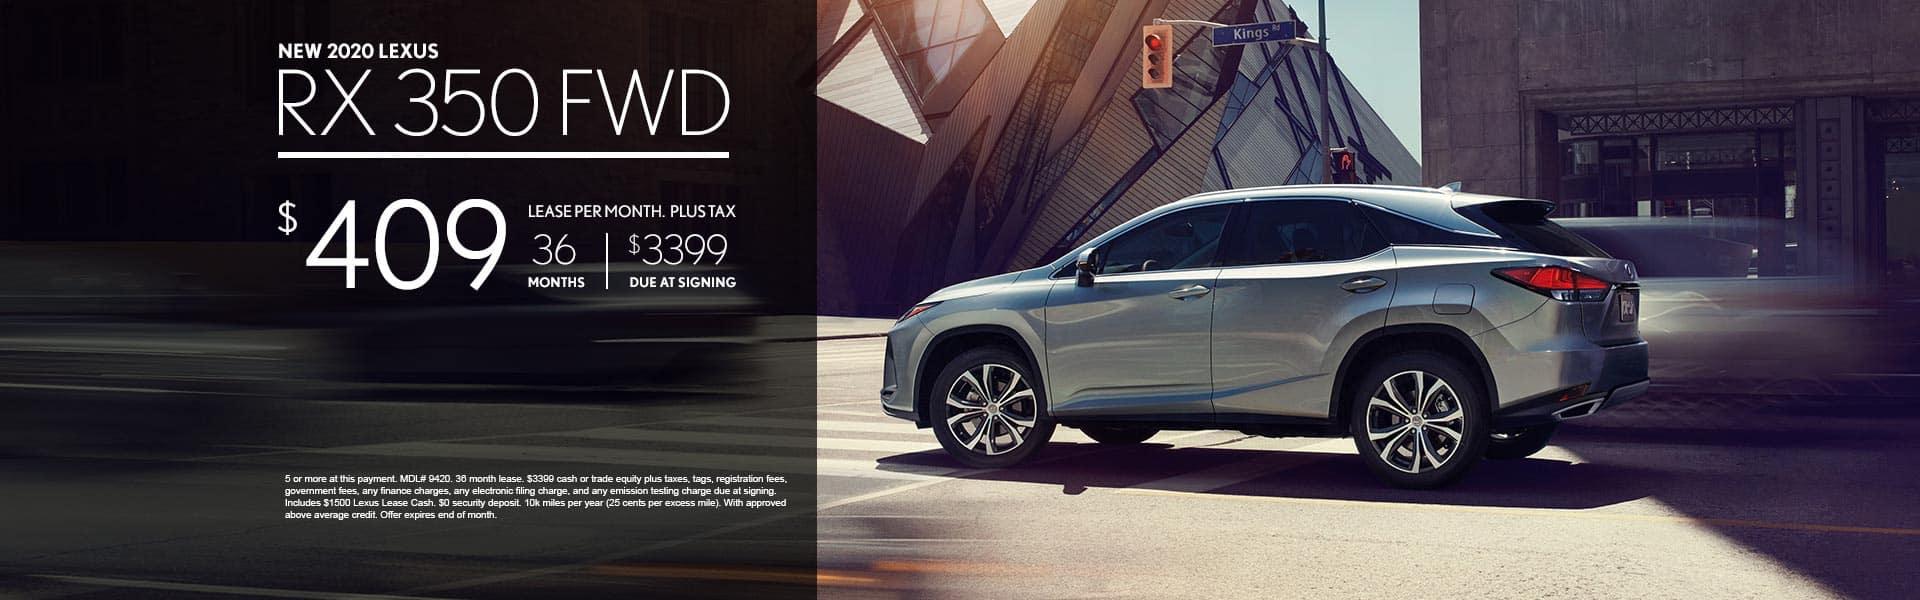 2020_Lexus_RX_350_FWD-Oct(1920x600)